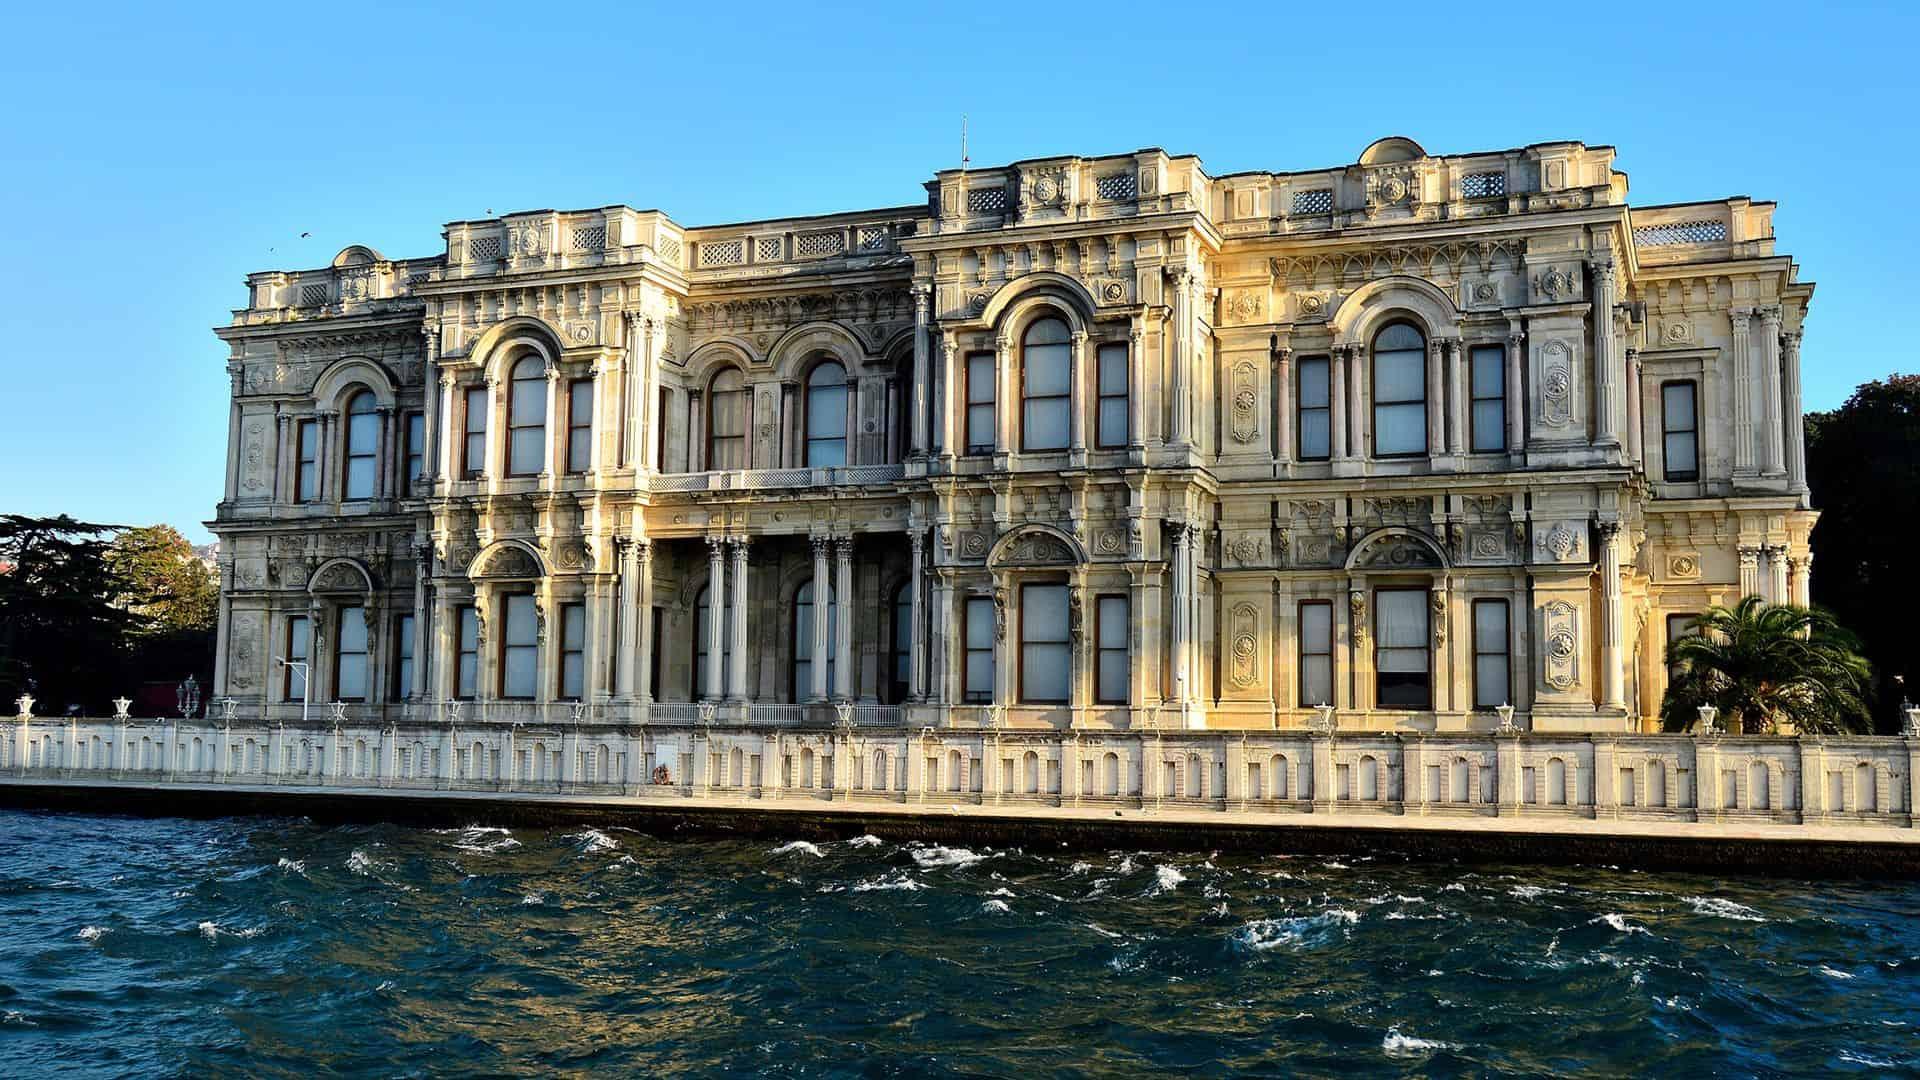 Beylerbeyi Palace from the Bosphorus